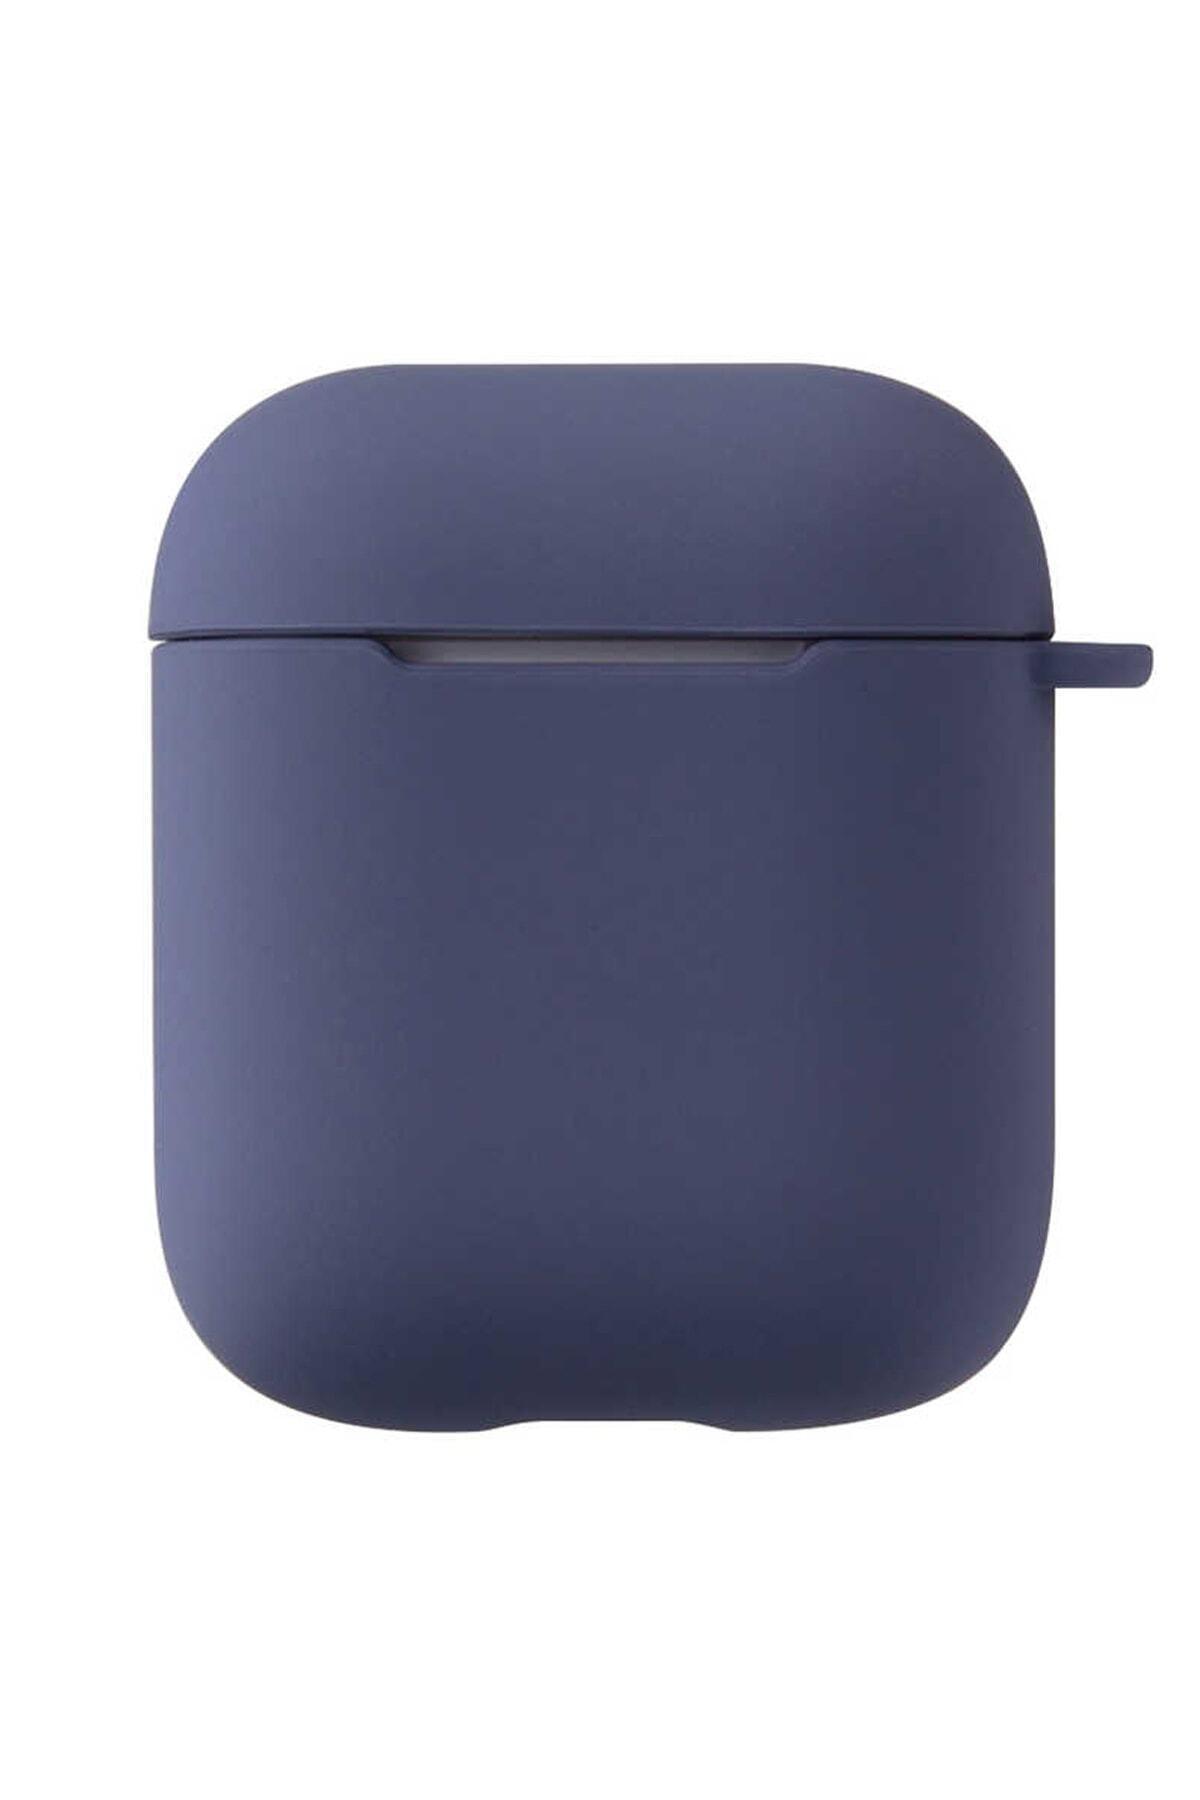 Sunix Apple Airpods Pastel Renkli Silikon Kılıf 1